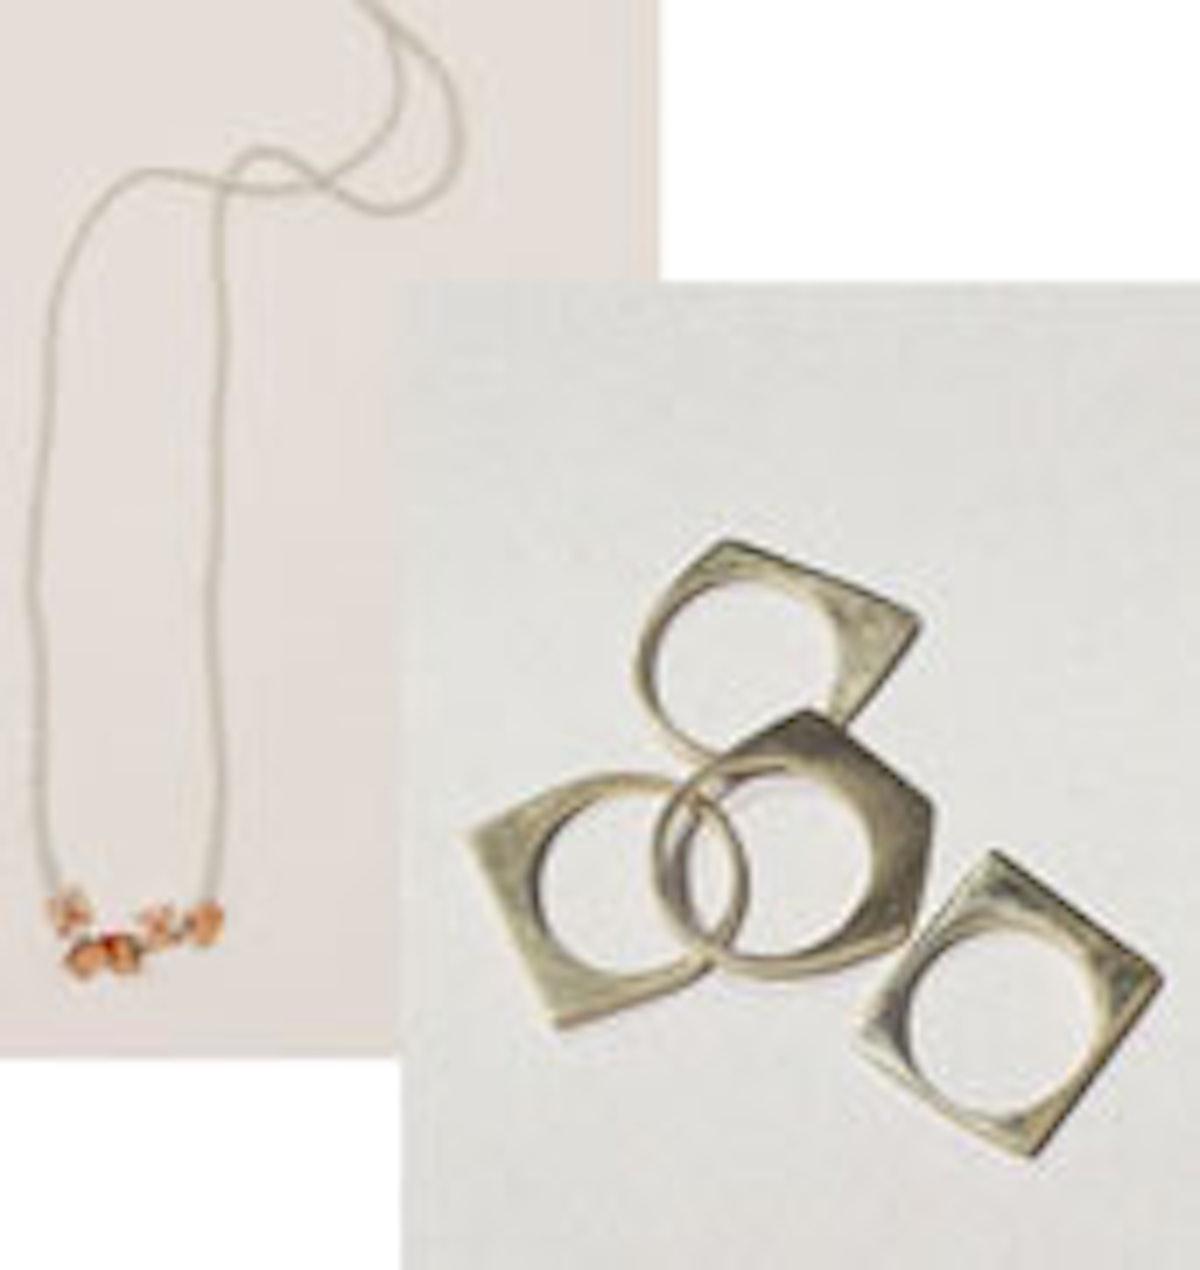 acss-brooklyn-jewelry-search.jpg